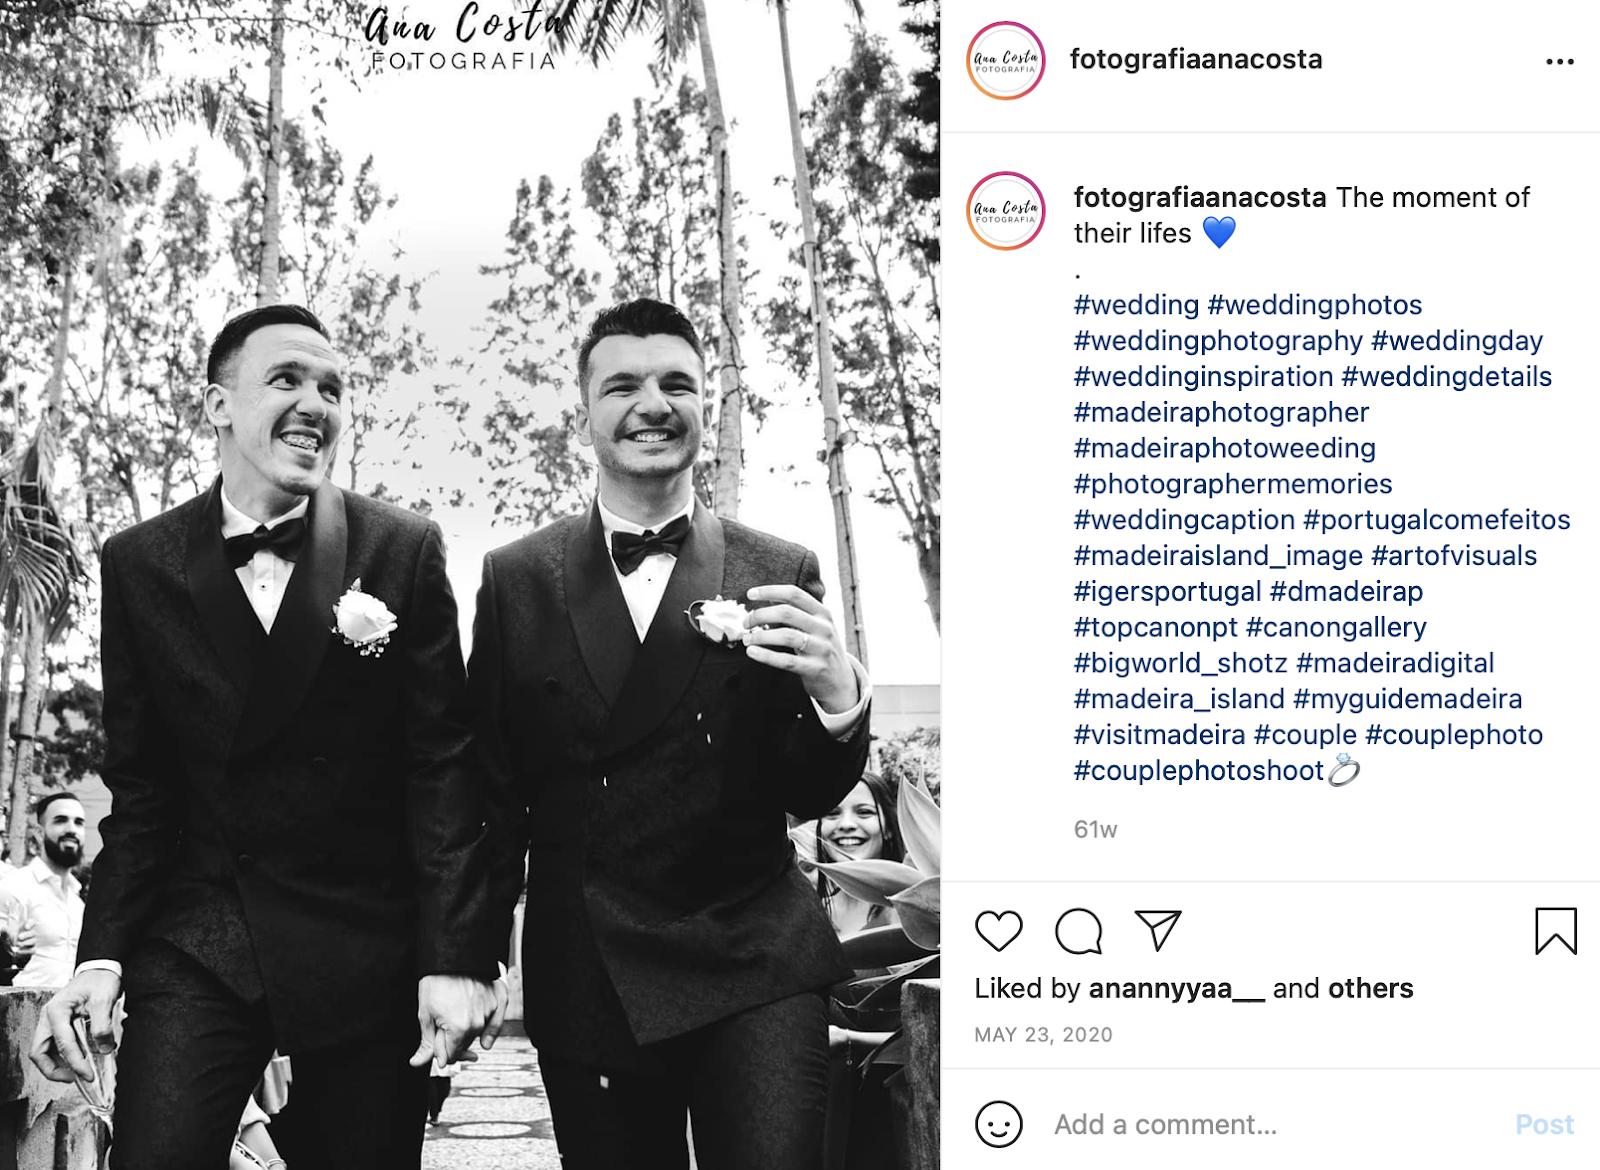 wedding day photo and wedding instagram caption